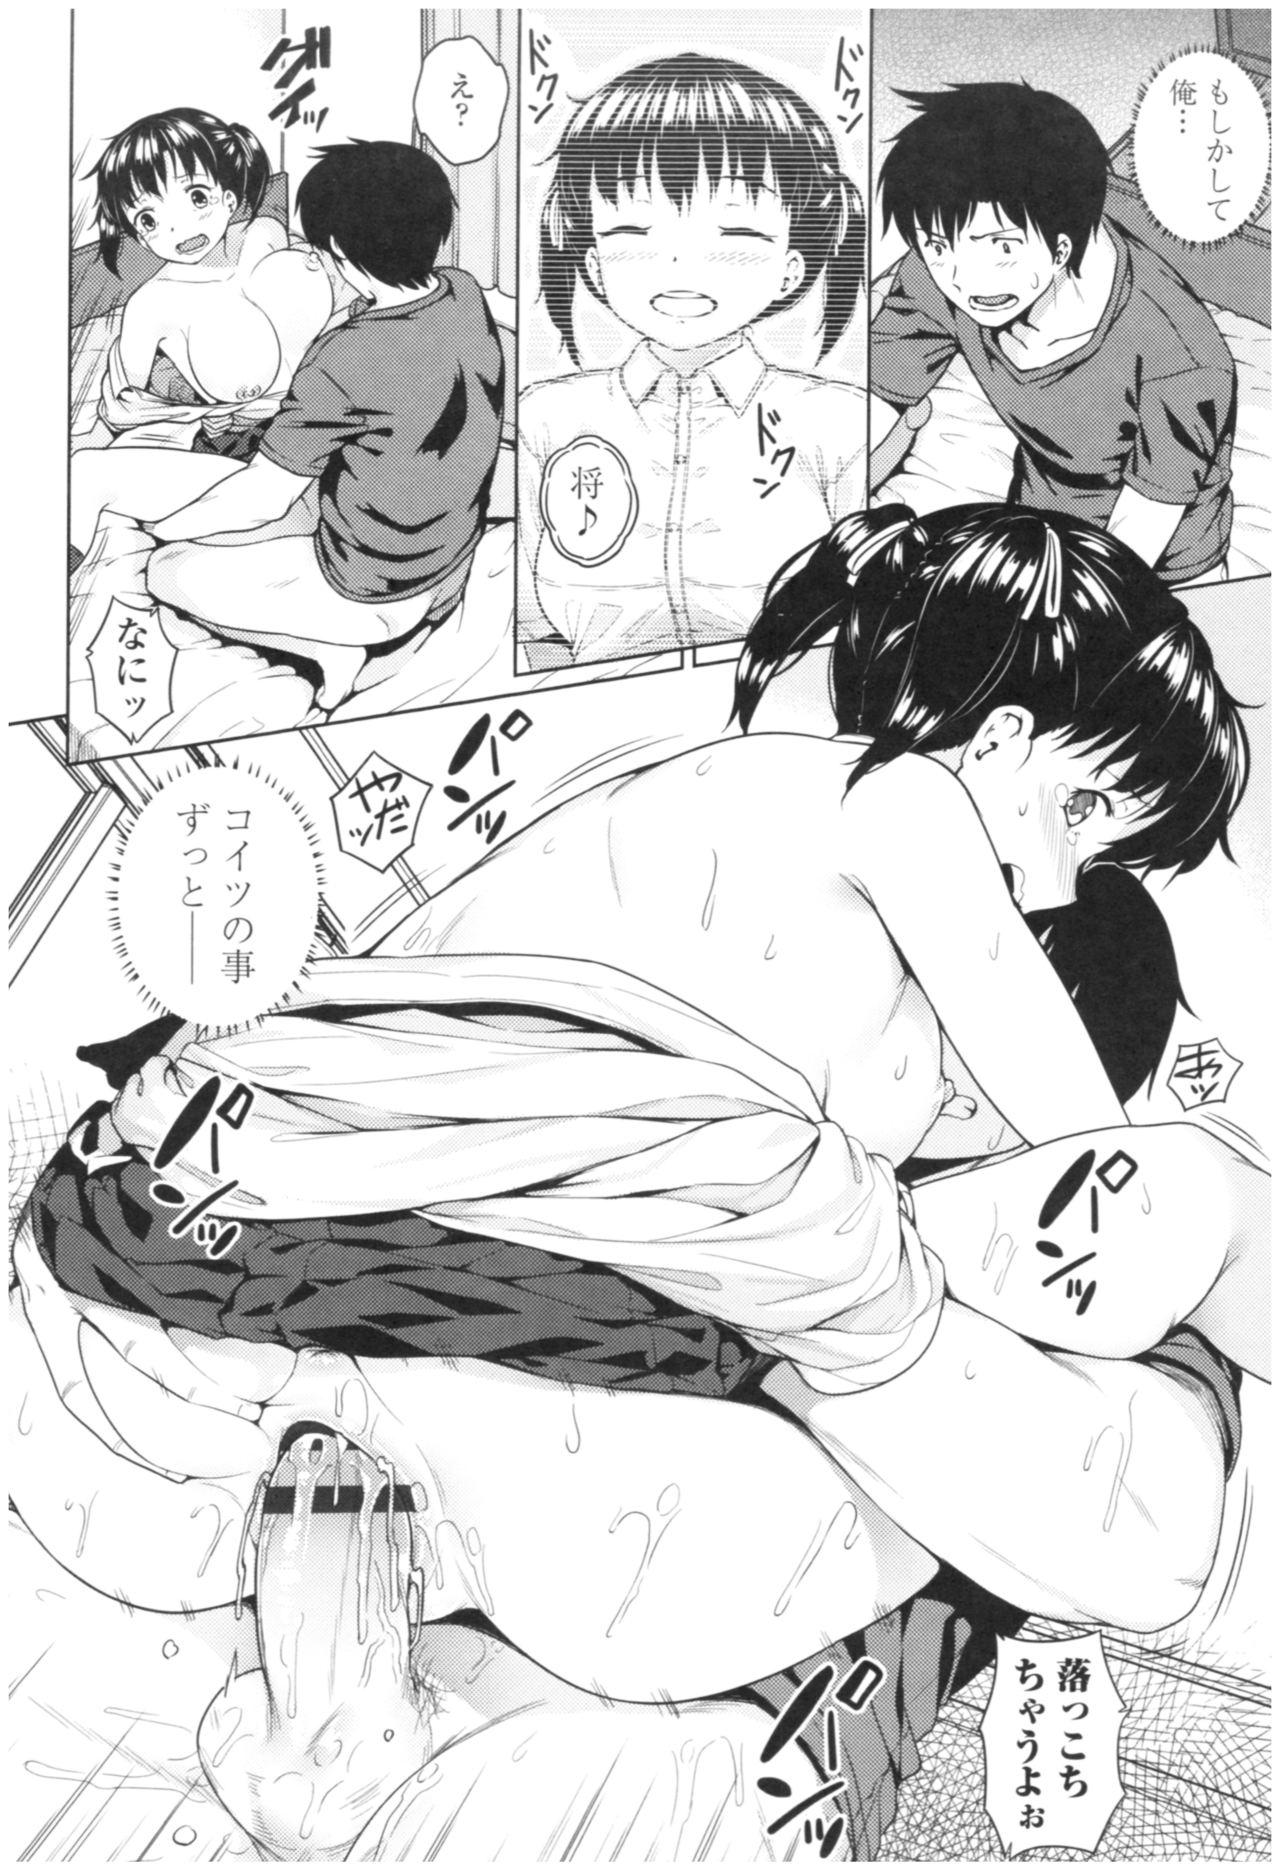 Bitch Kanojo no Hatsukoi Jouji - Her Lewd First Love and SEX 150